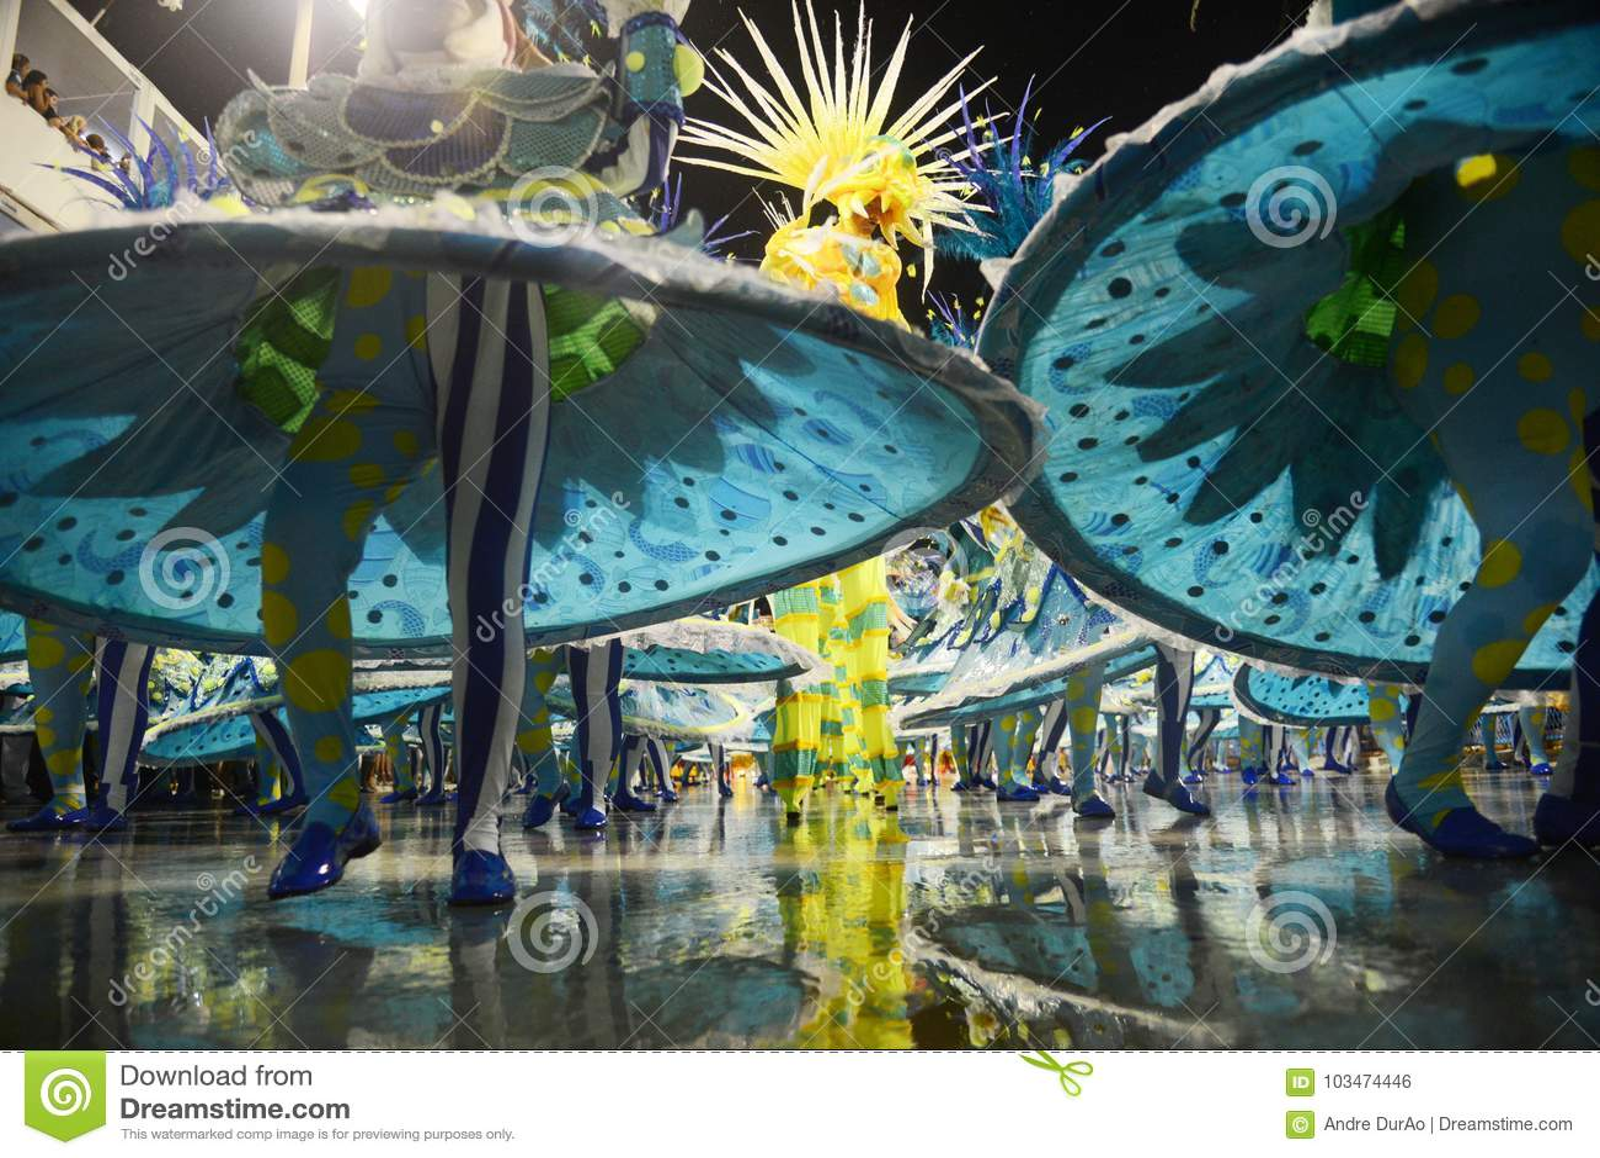 Carnaval Samba Dancer Brazil